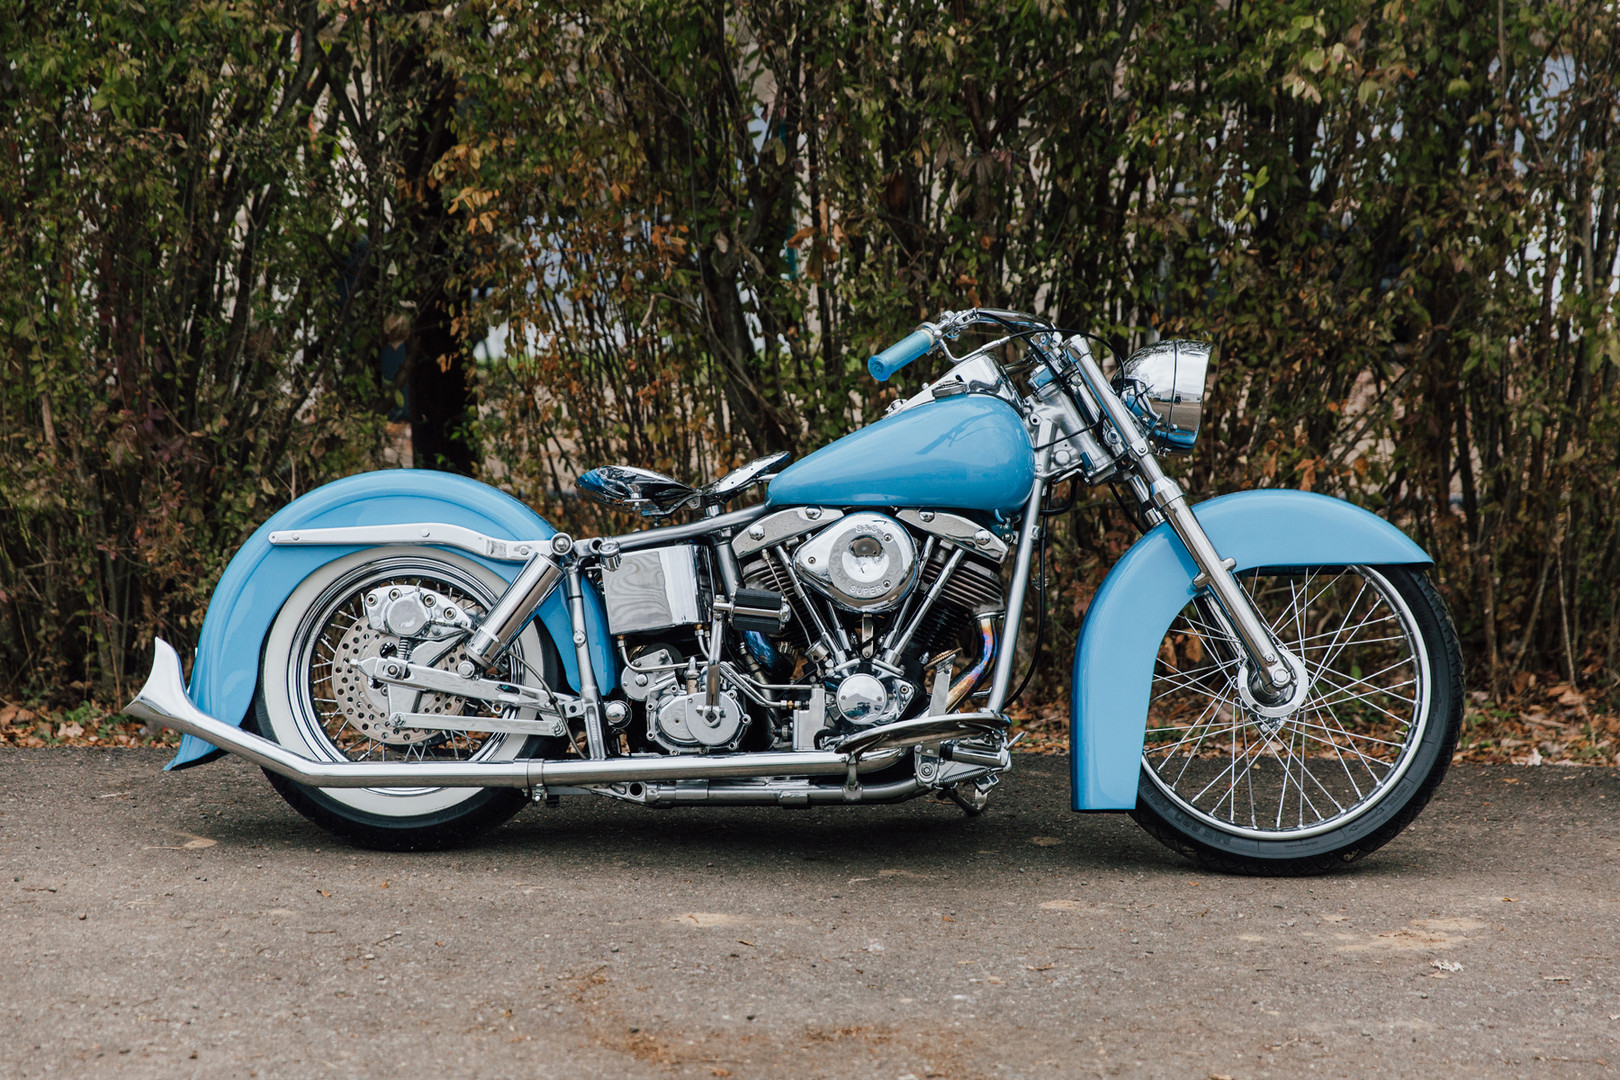 Greg-Gump-Harley-Davidson-evo-chopper-bo